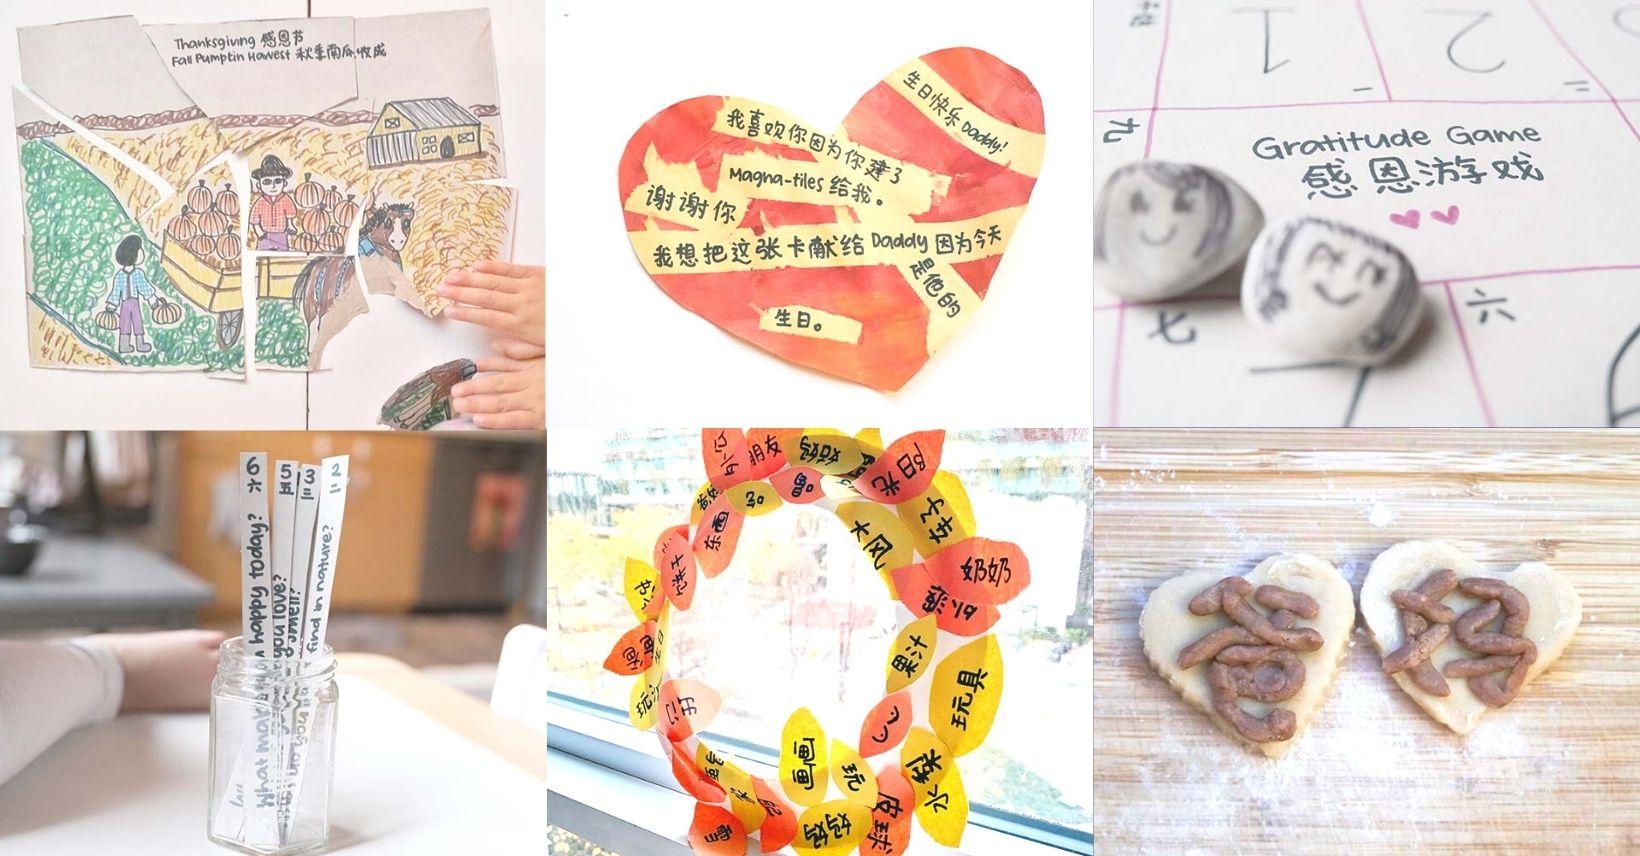 6 Montessori-inspired Gratitude Activities for Thanksgiving Season